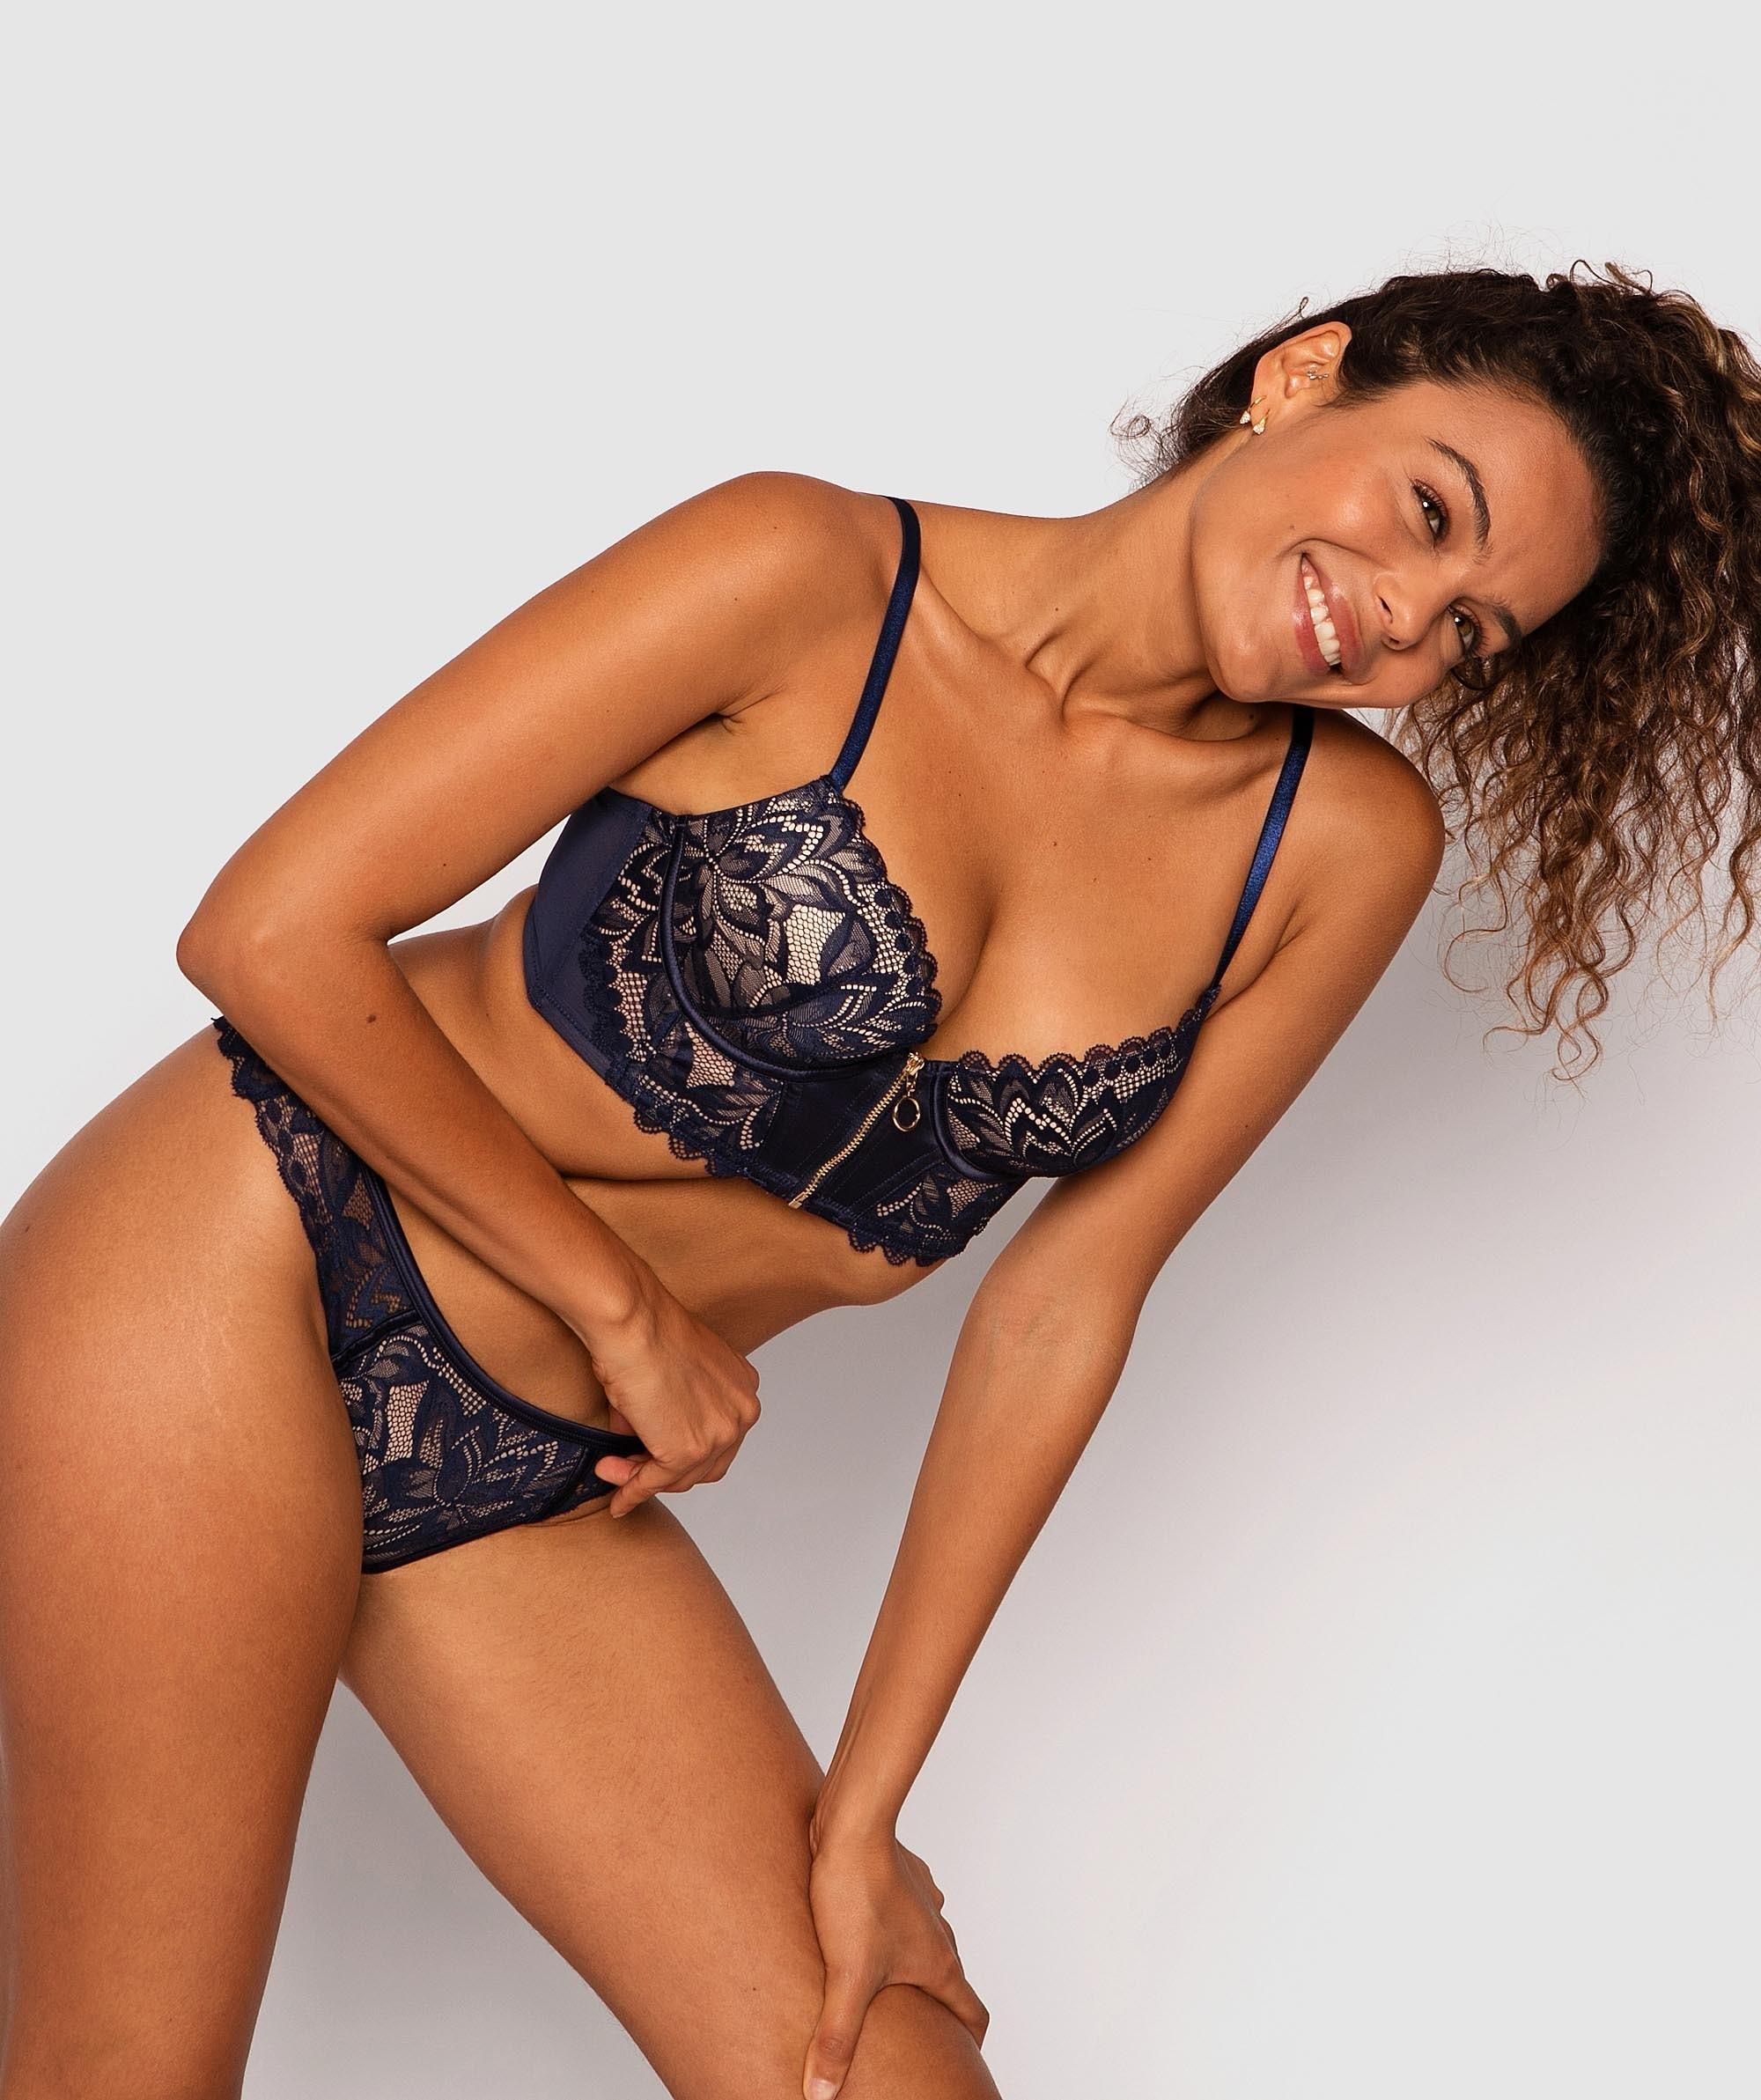 Everley Balconette Push Up Bra - Dark Blue/Nude